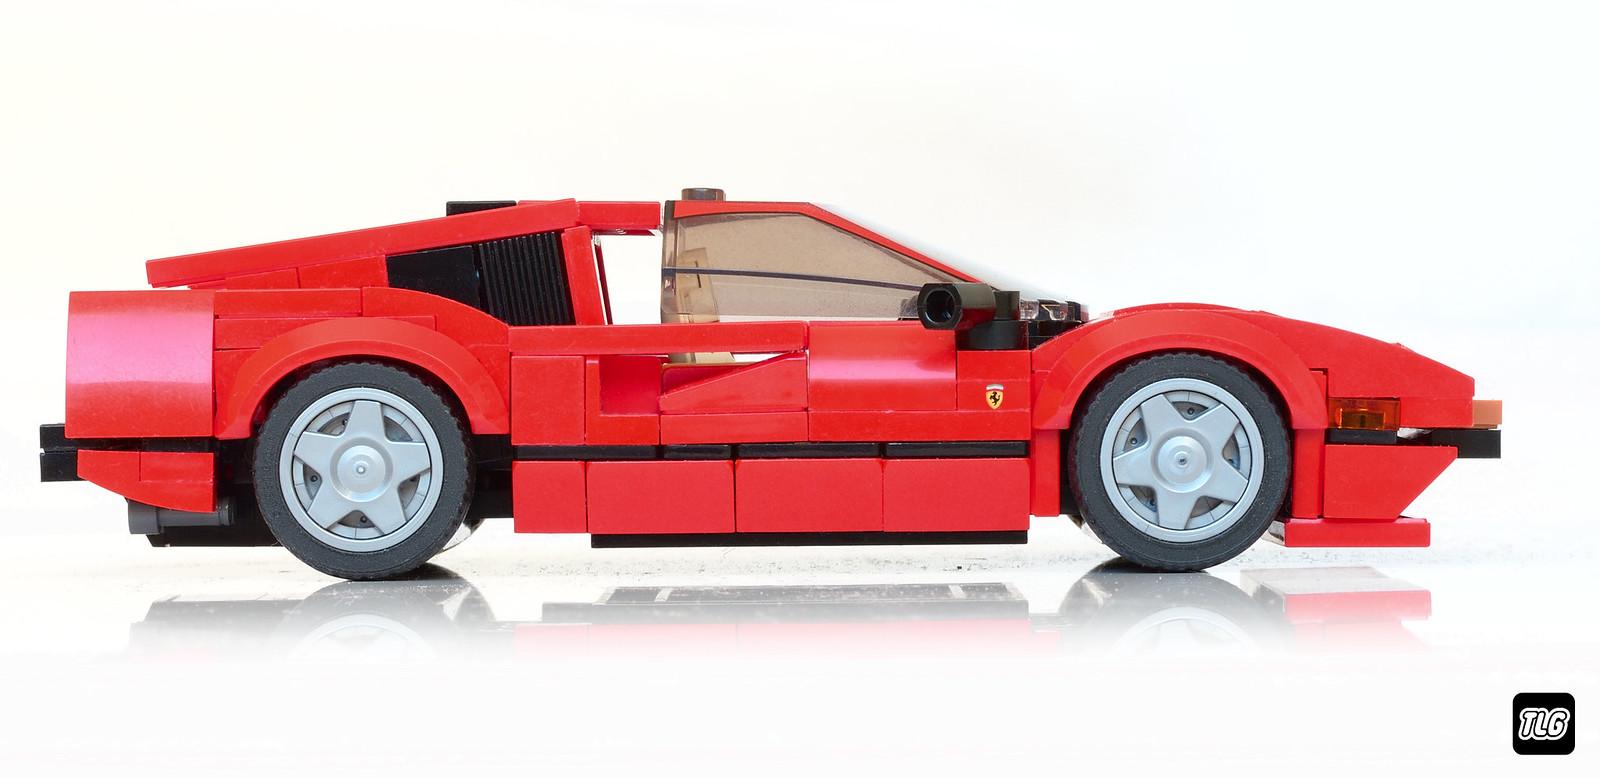 Ferrari 308 GTB Q. 03 - INSTRUCTIONS